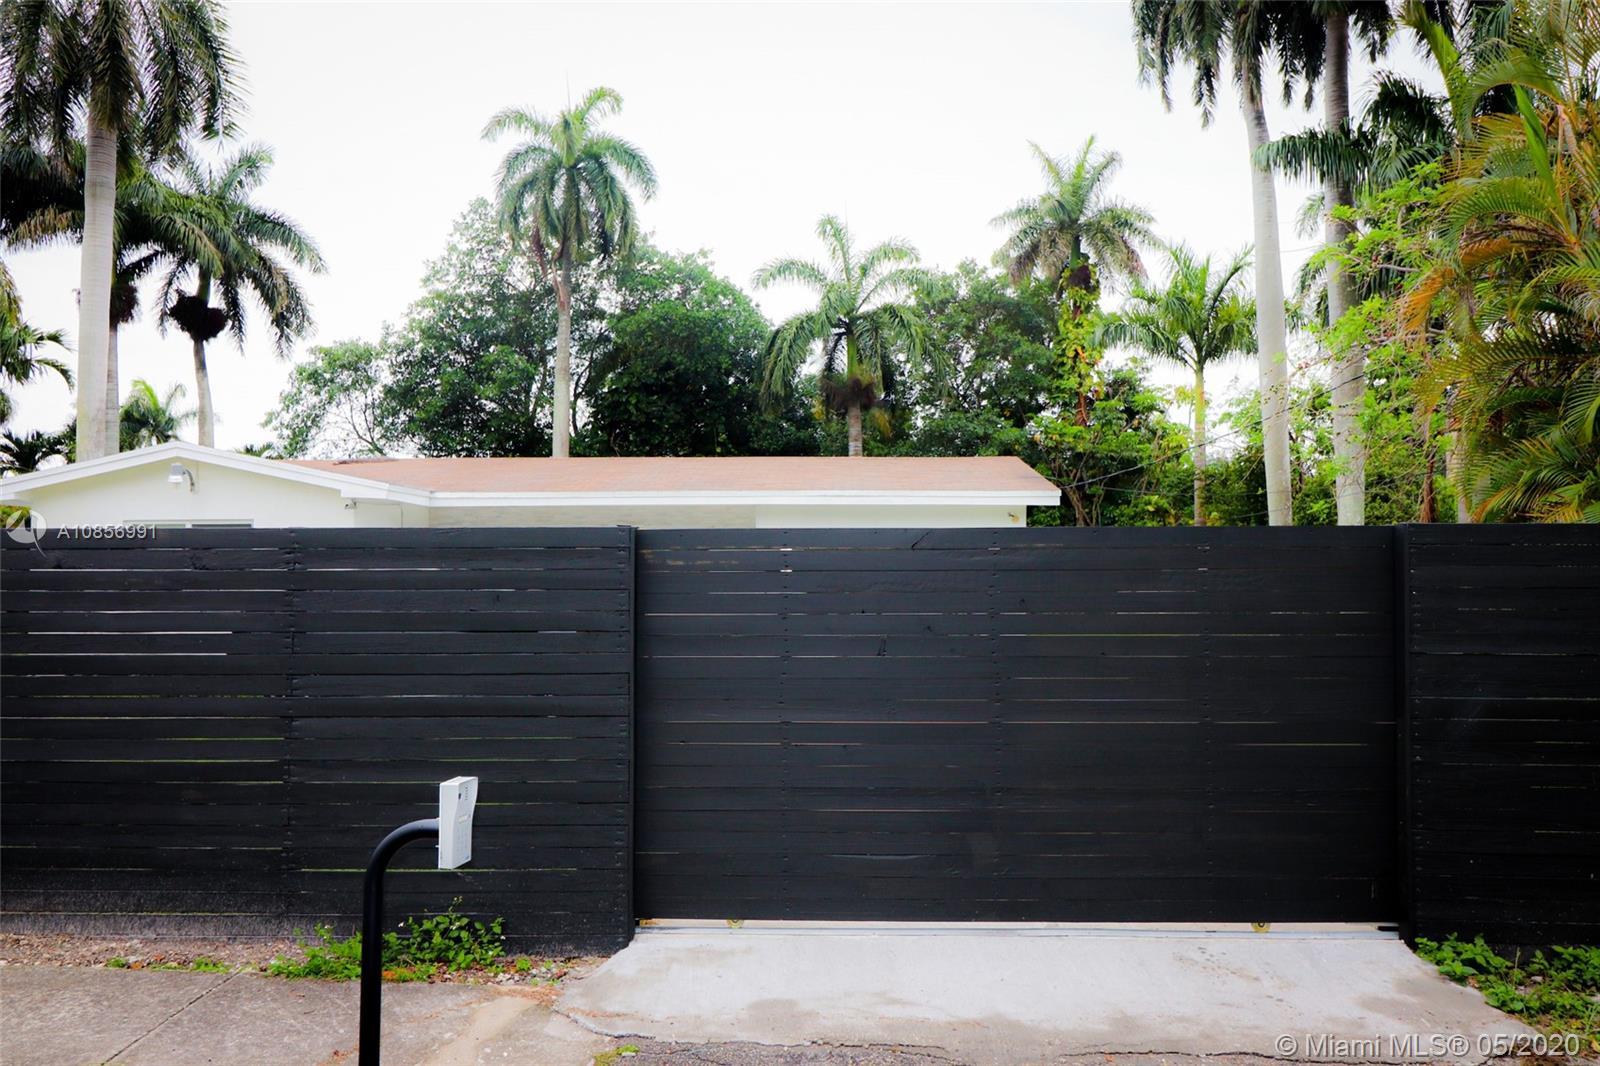 186 NE 159th St, Miami Shores, Florida